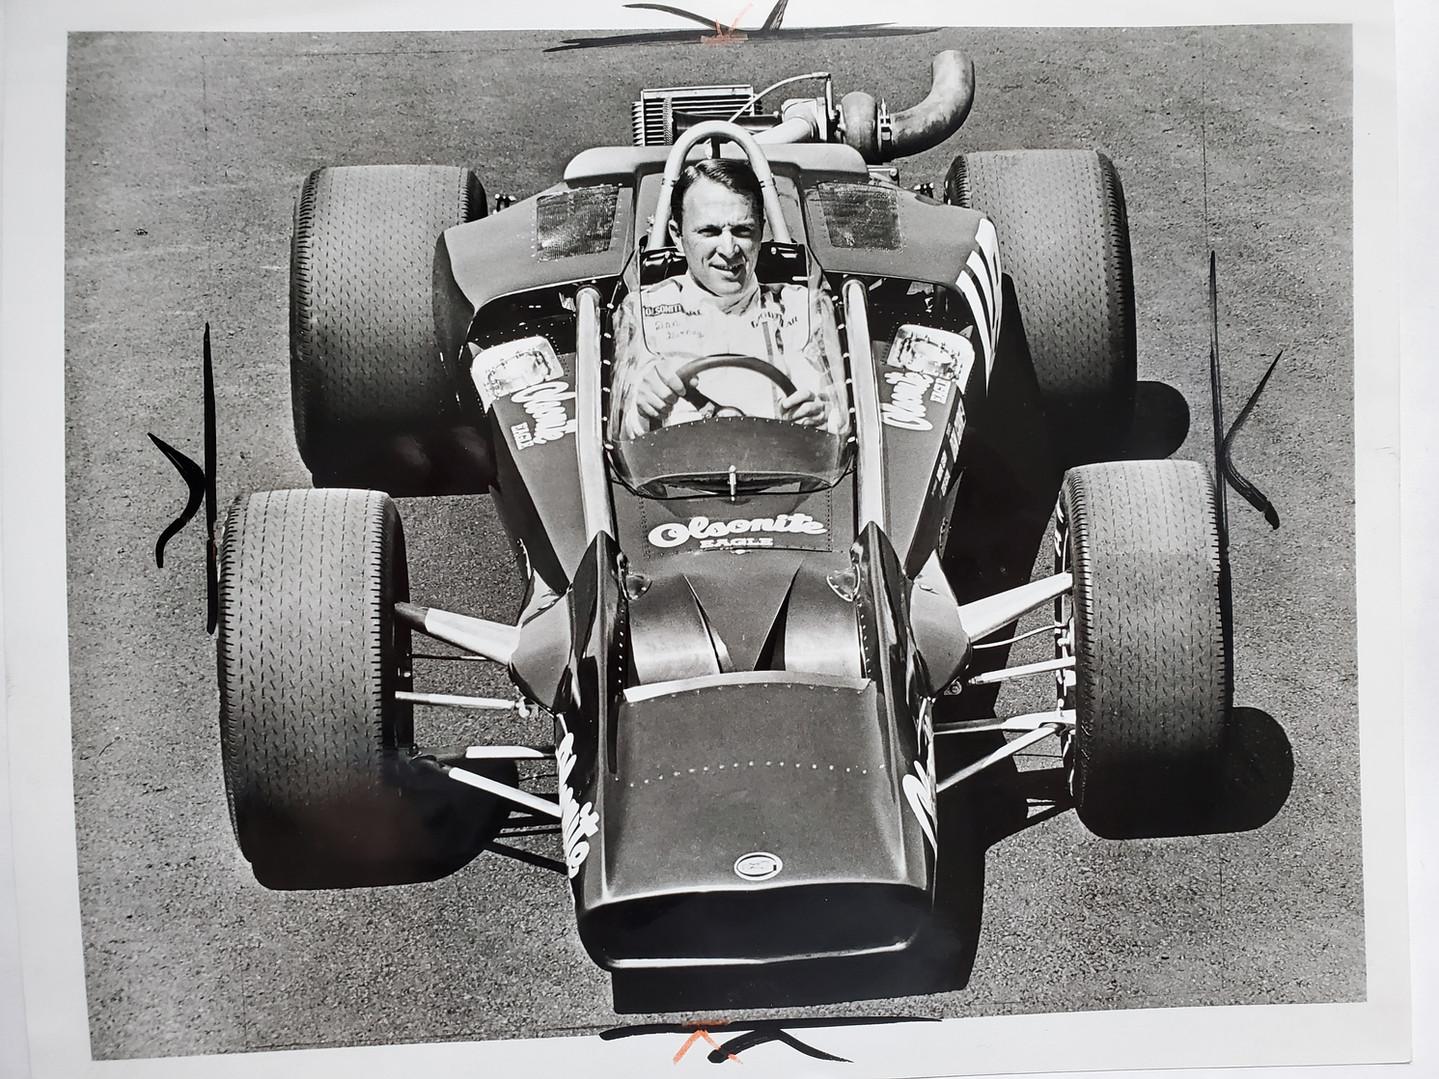 Dan Gurney May 1970  Olsonite Eagle-Offy